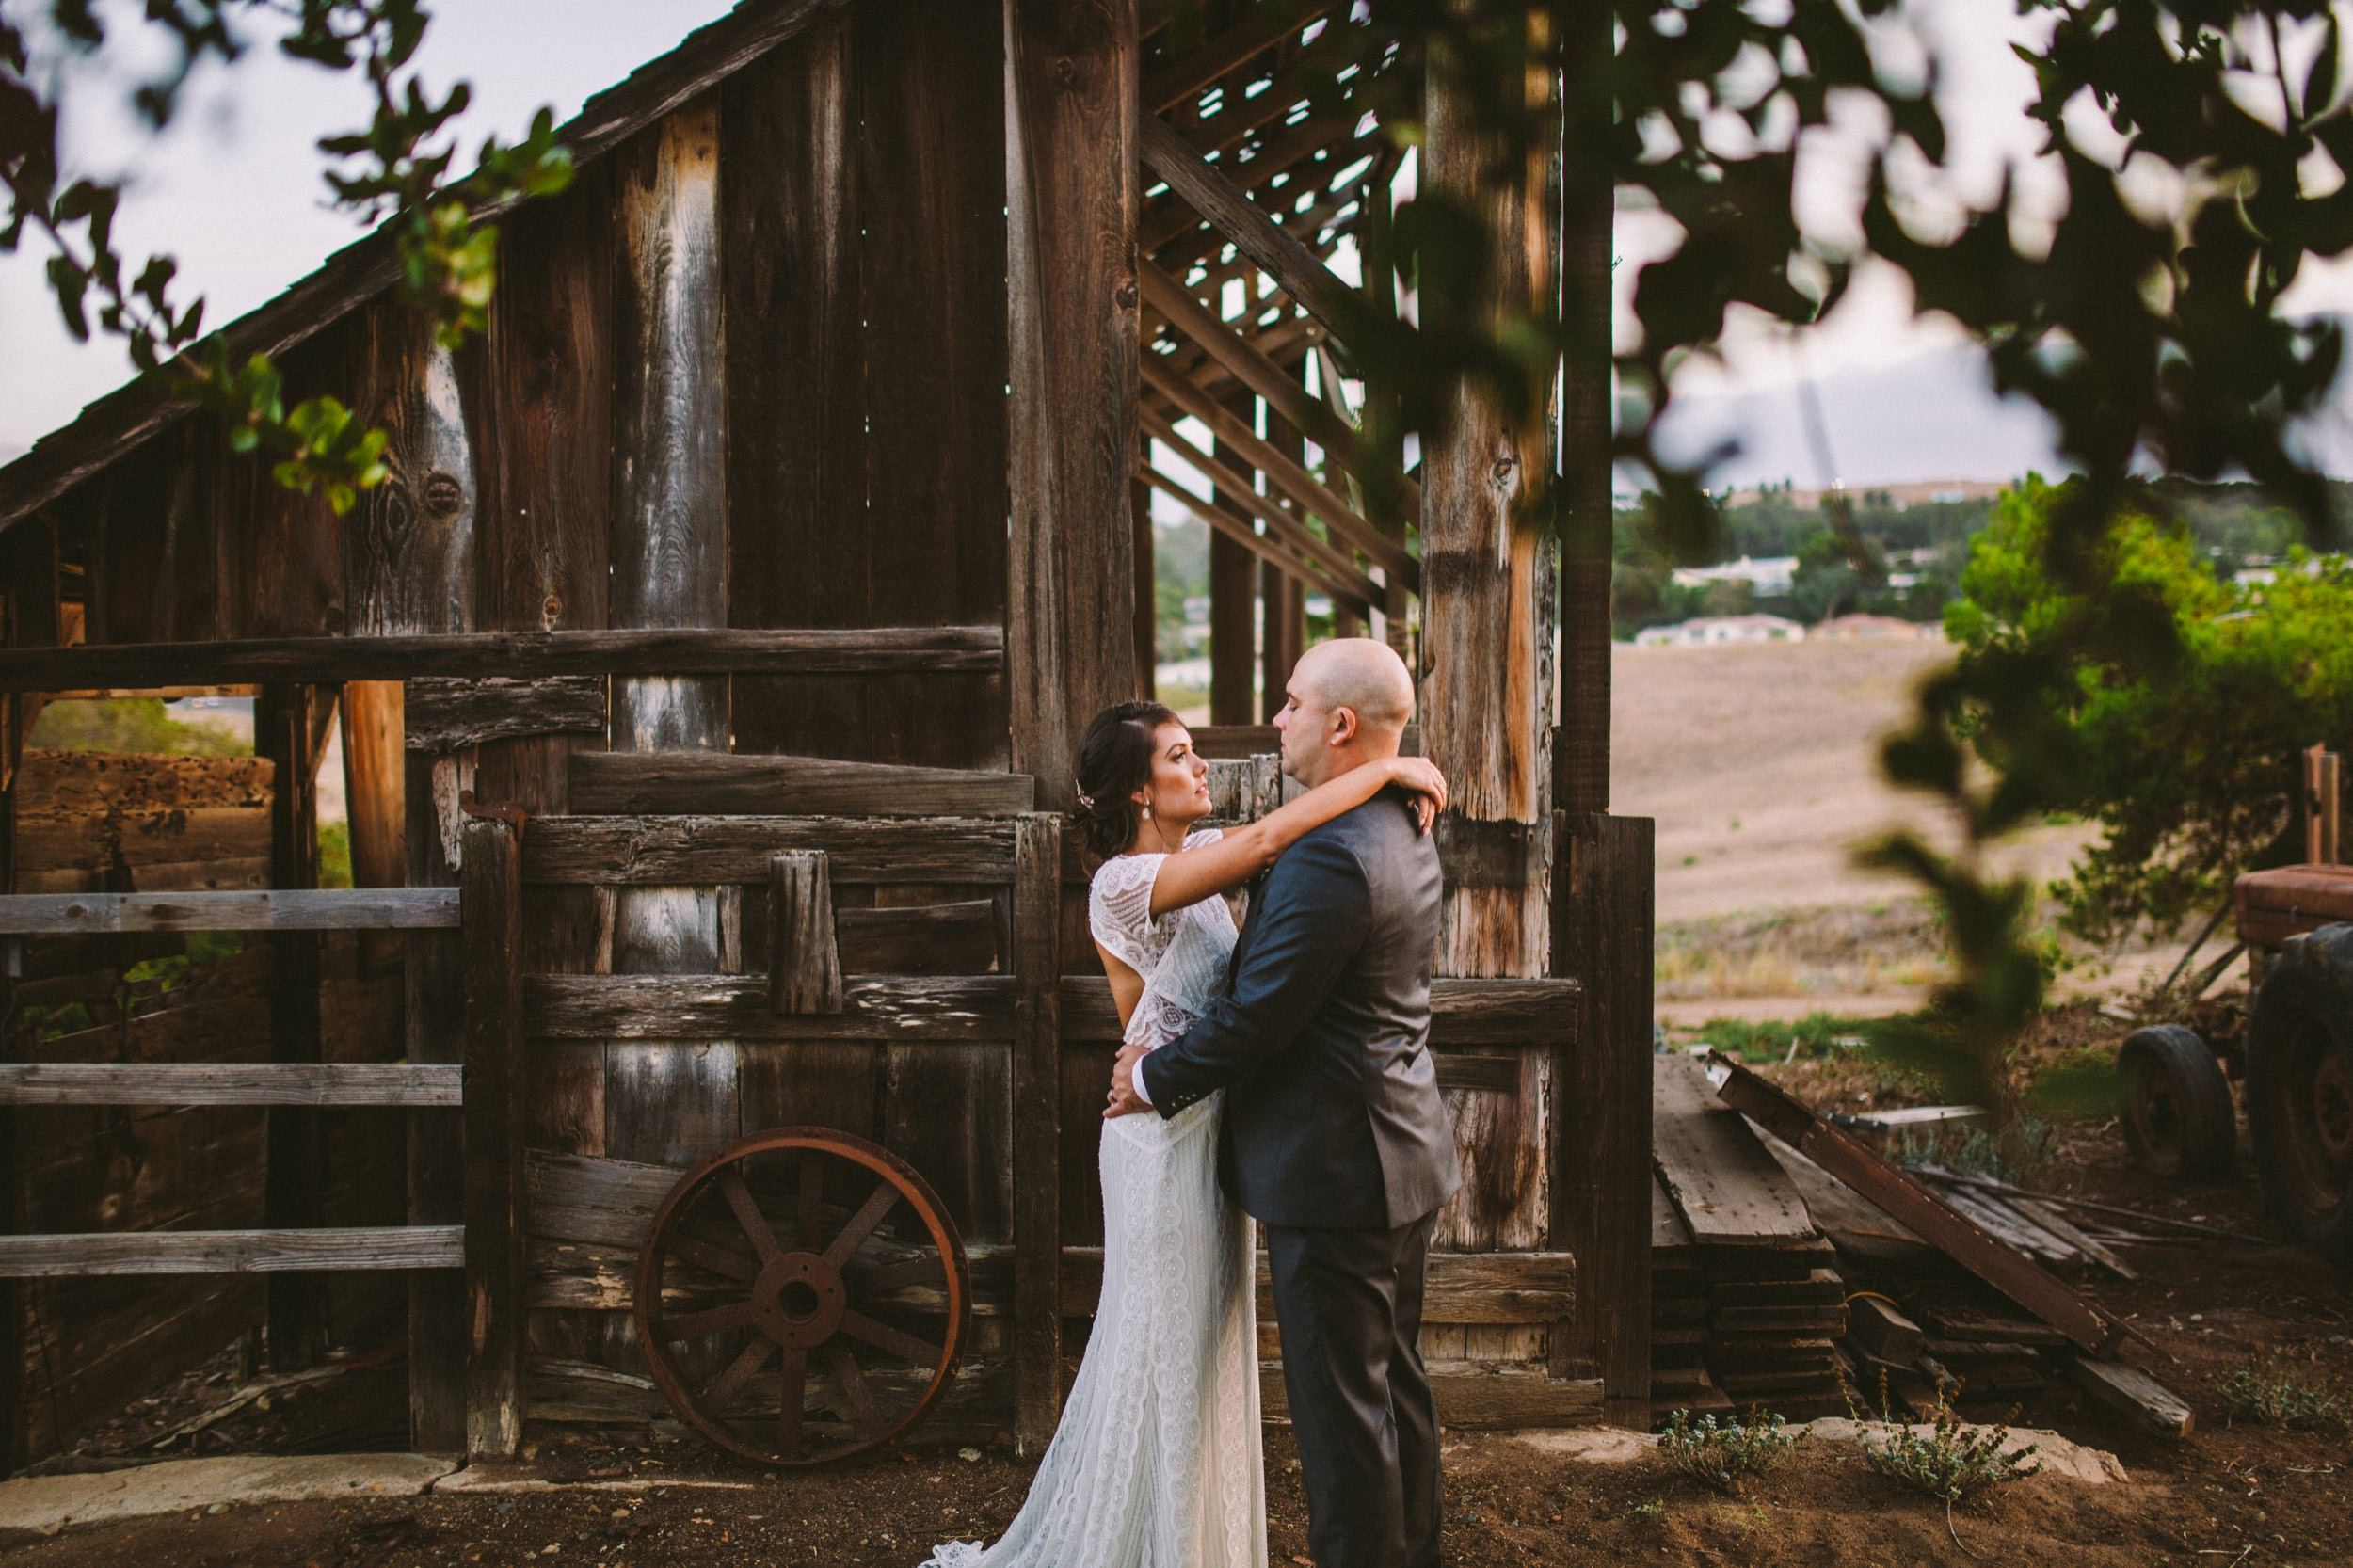 Rustic Barn Wedding Photography in Carlsbad